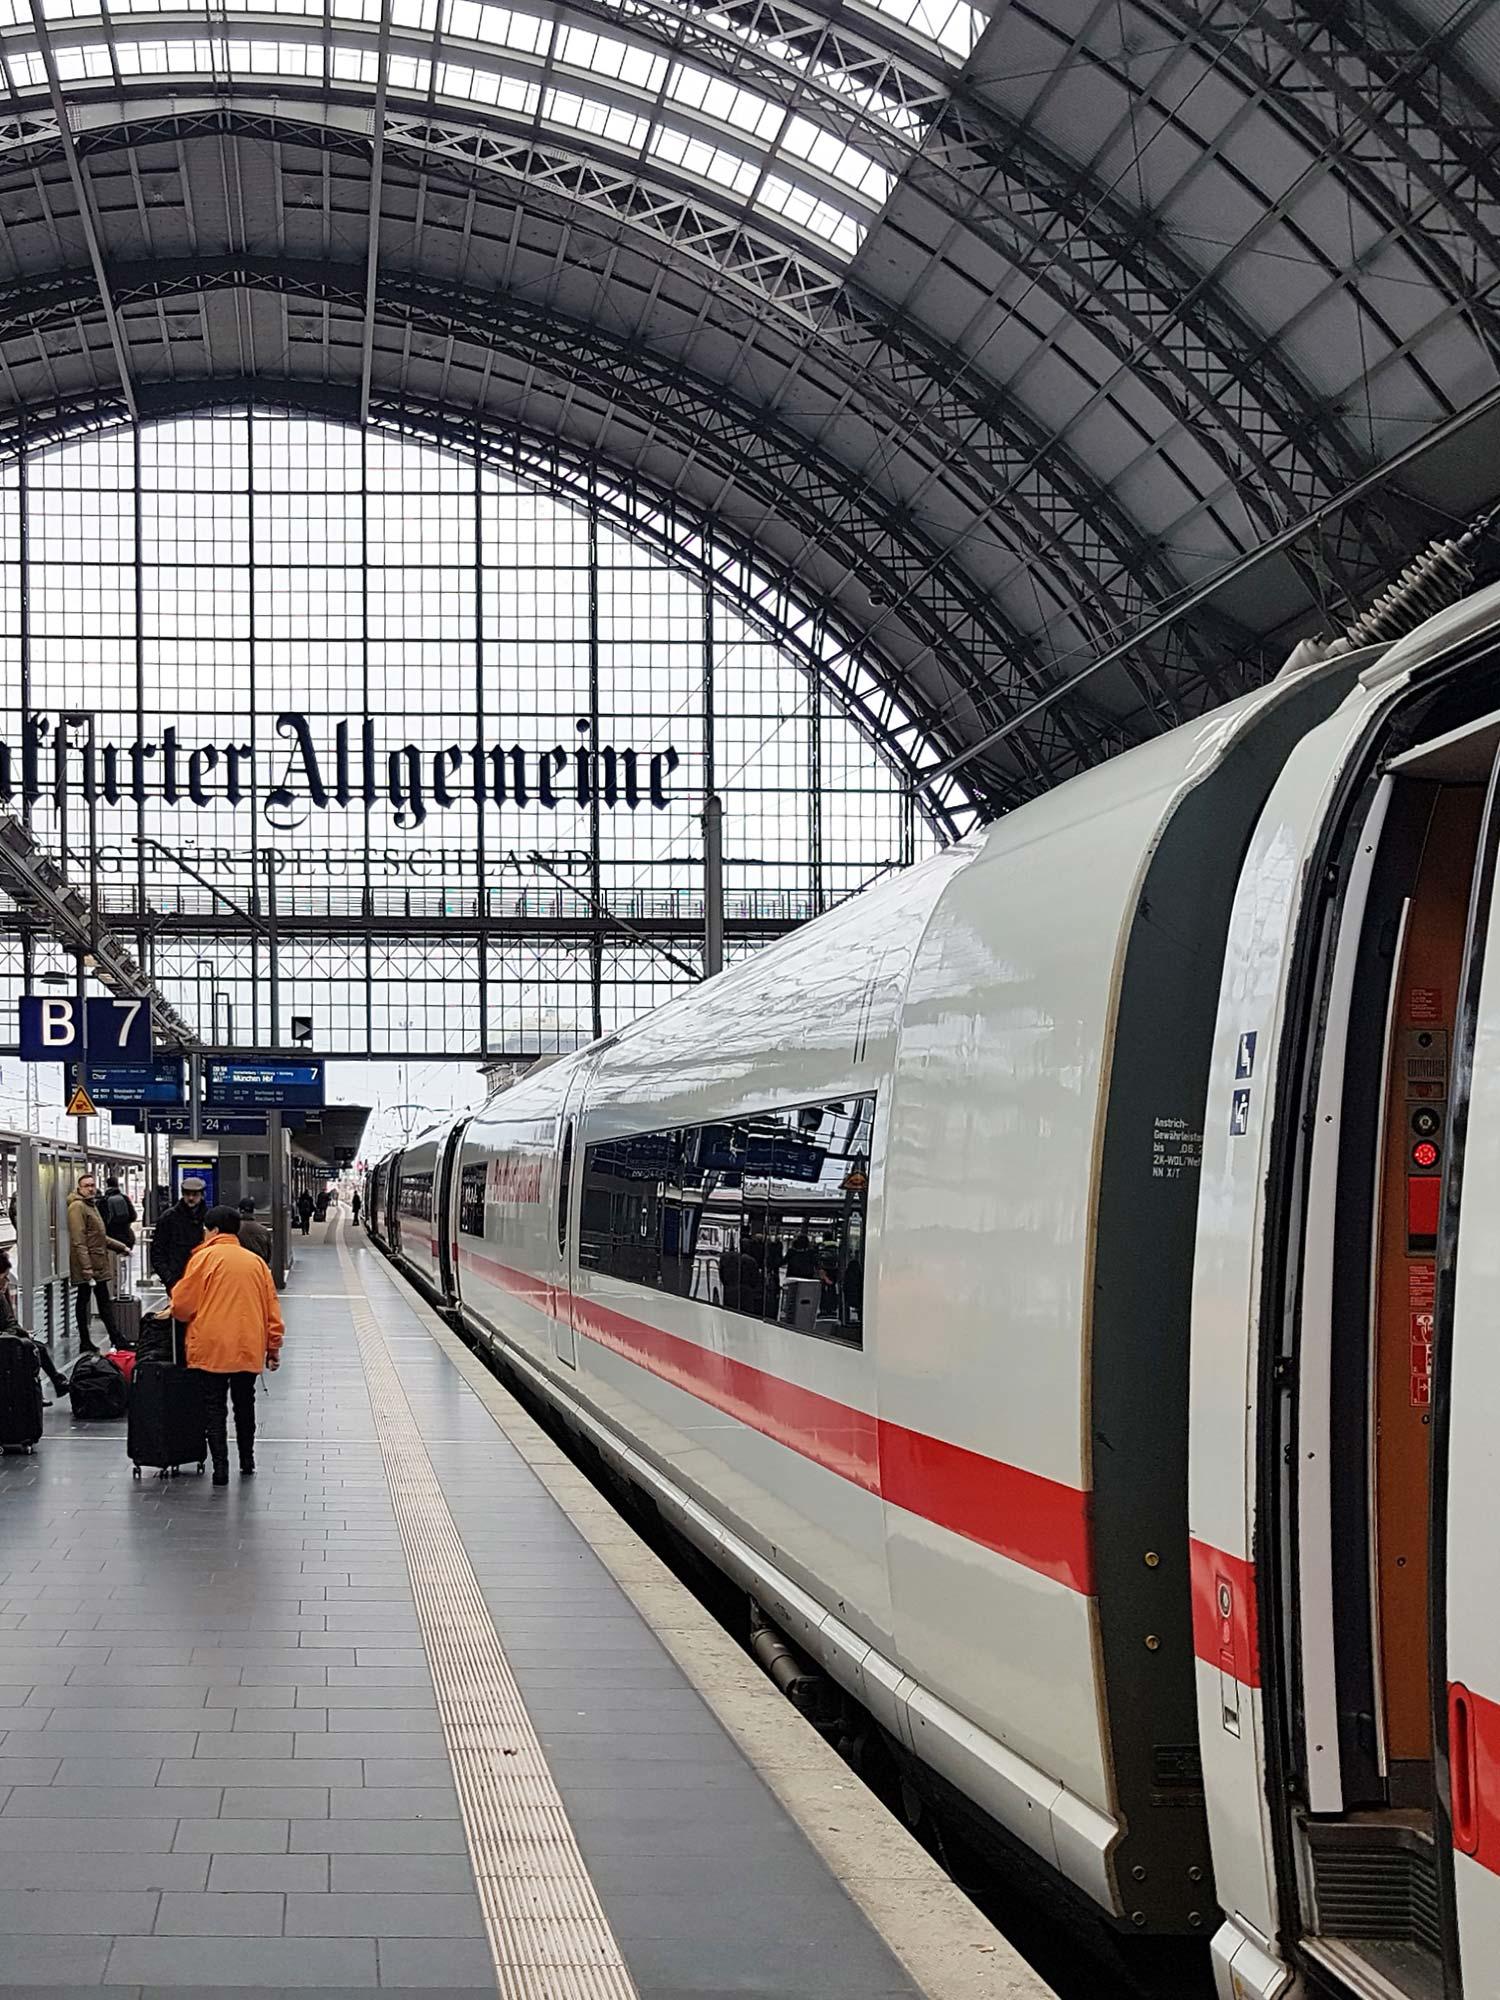 Verkehrsknotenpunkt Hauptbahnhof - Hier kreuzen die verschiedensten Bahnverbindungen